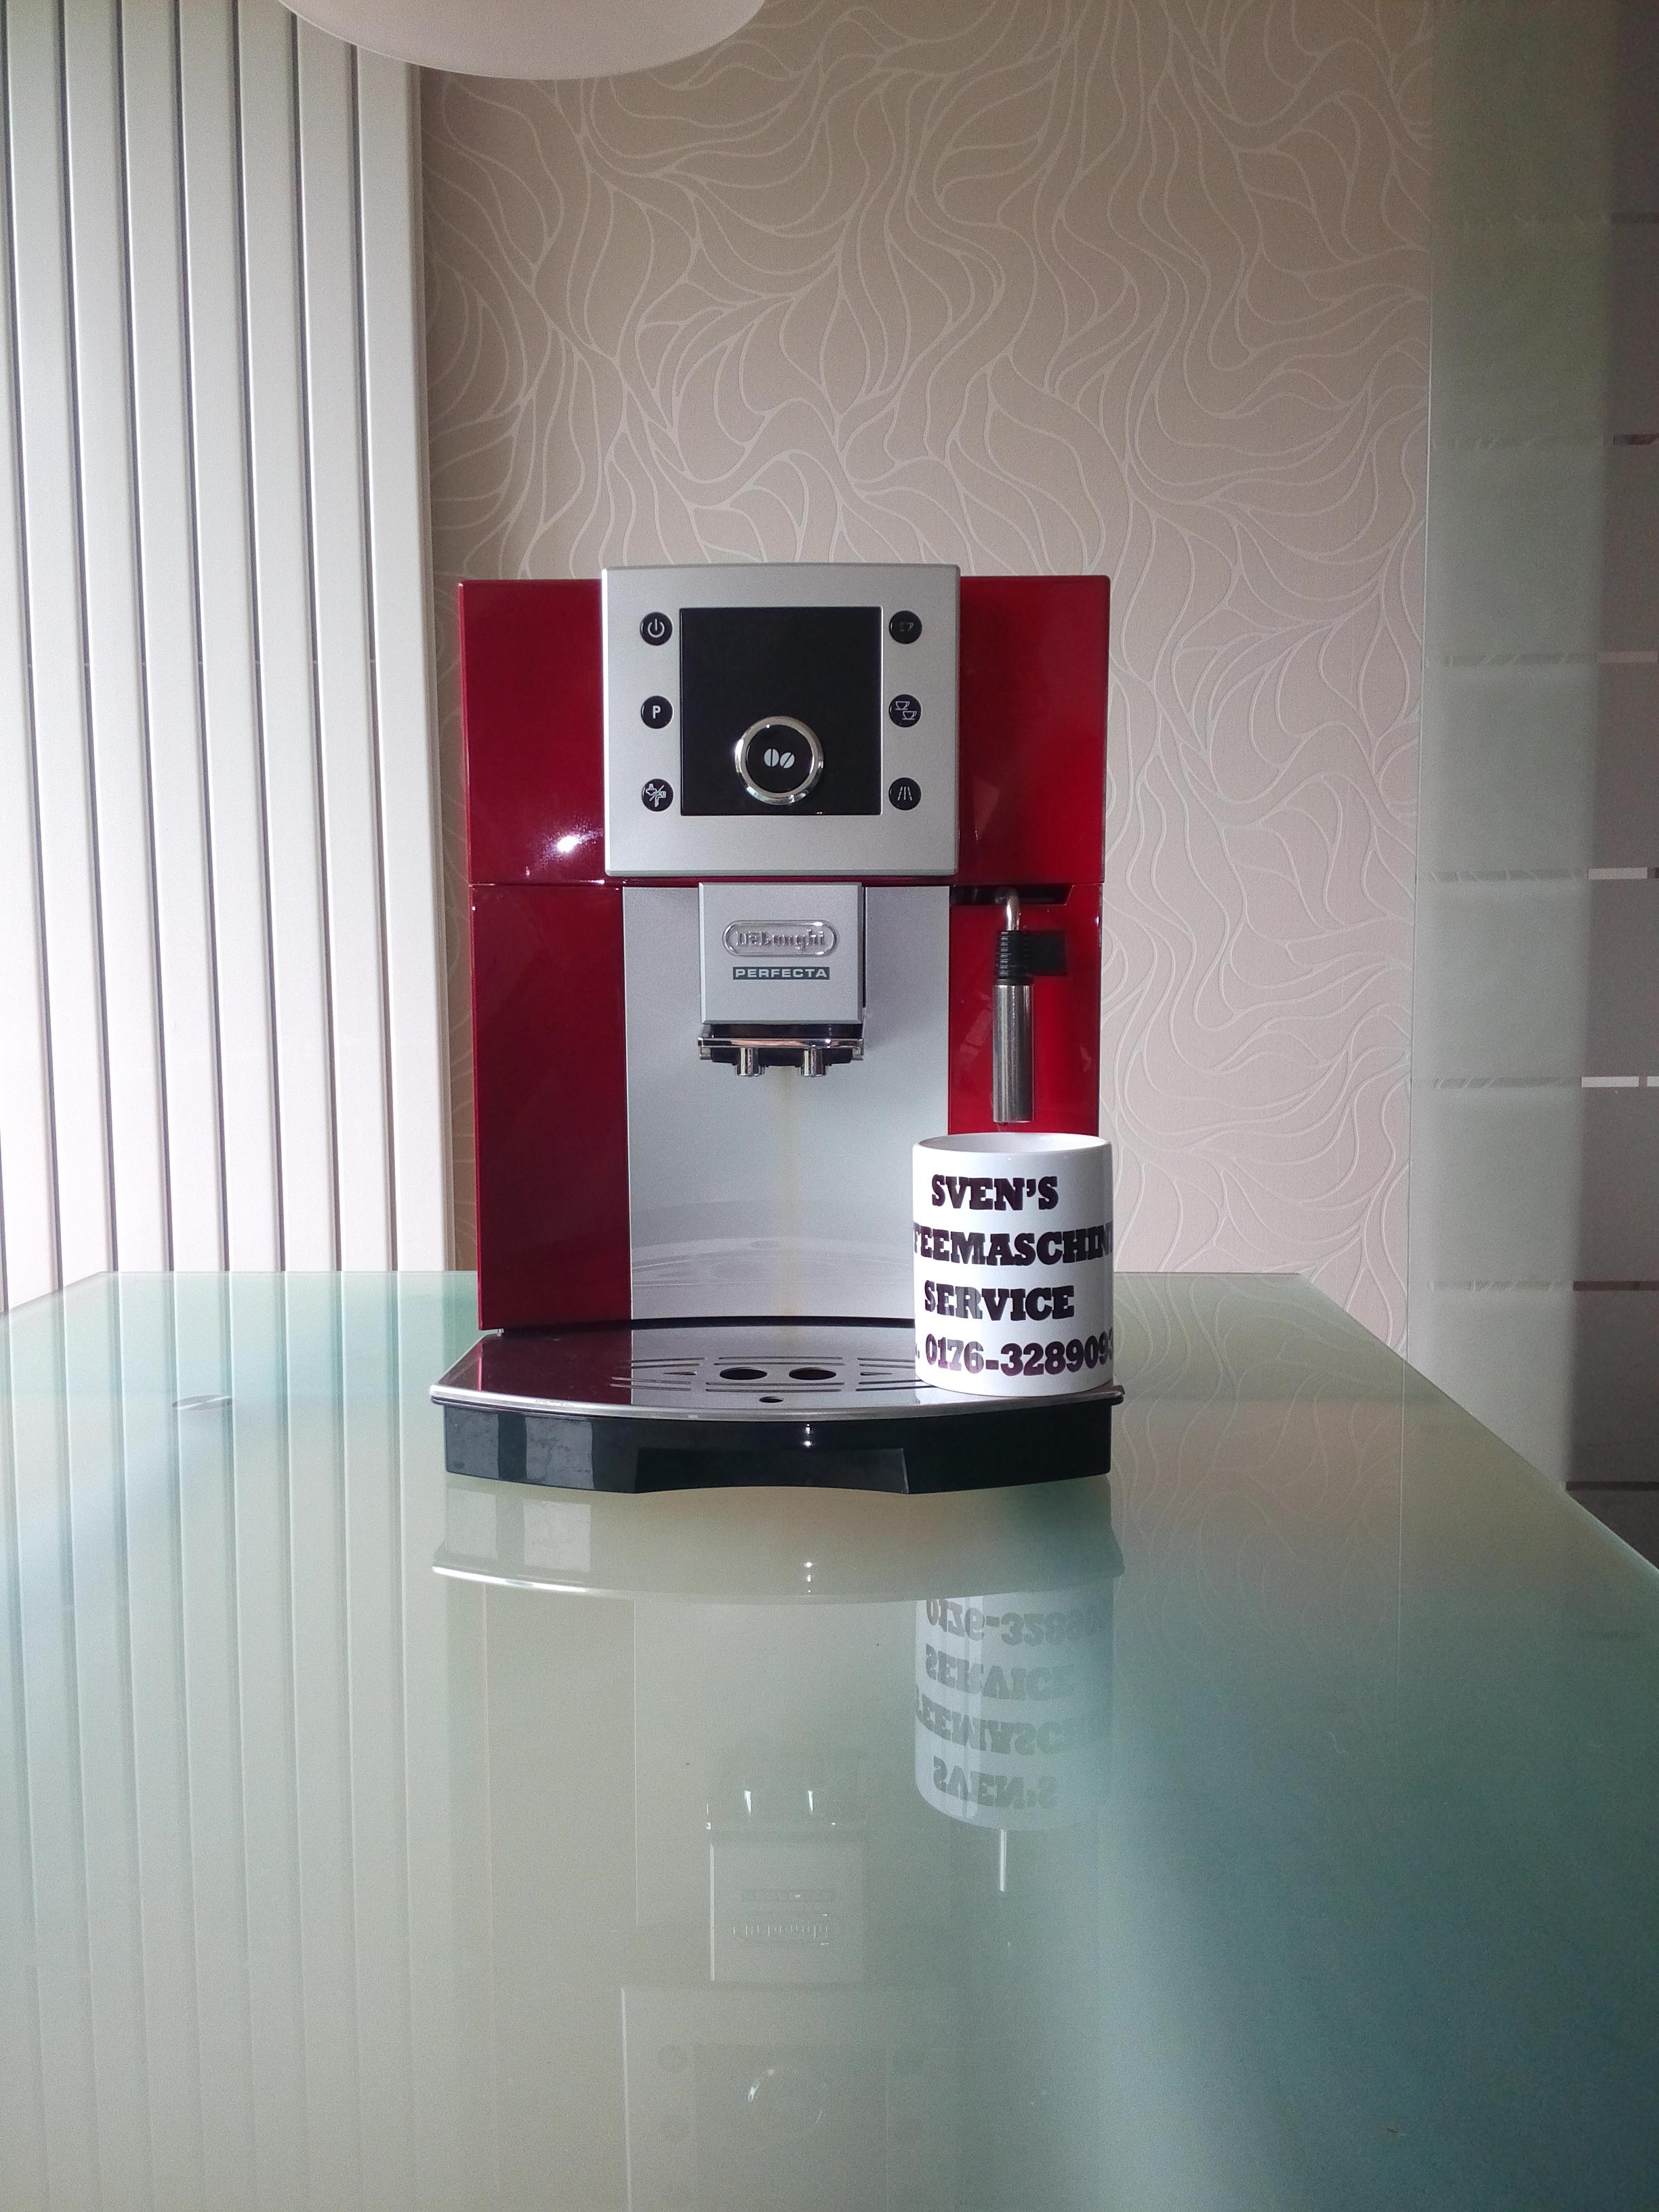 Svens Kaffeevollautomaten Reparatur Service